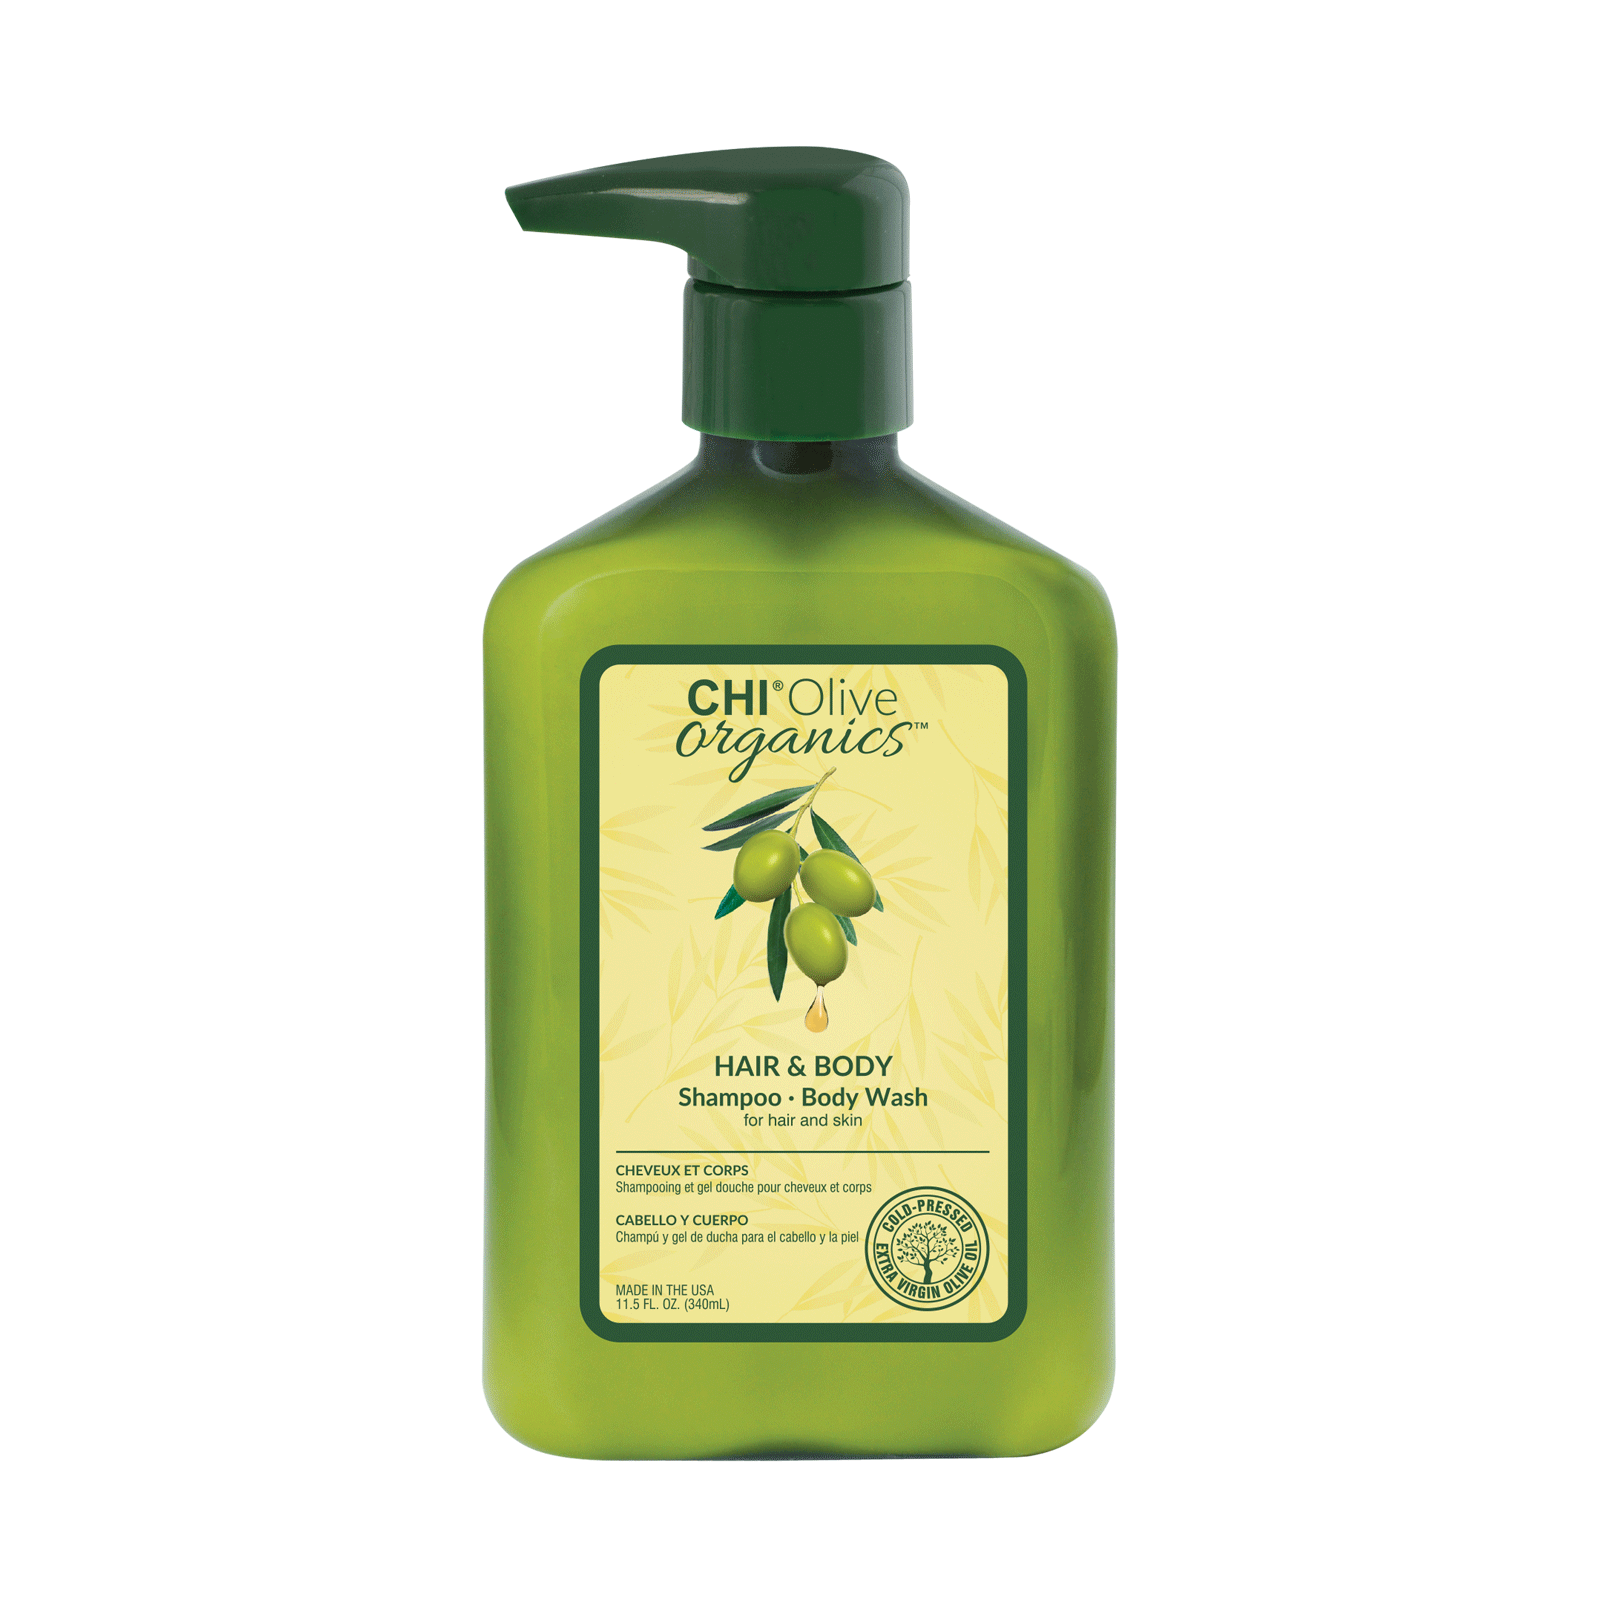 Farouk CHI Olive Organics Hair & Body Shampoo Body Wash,  11.5oz